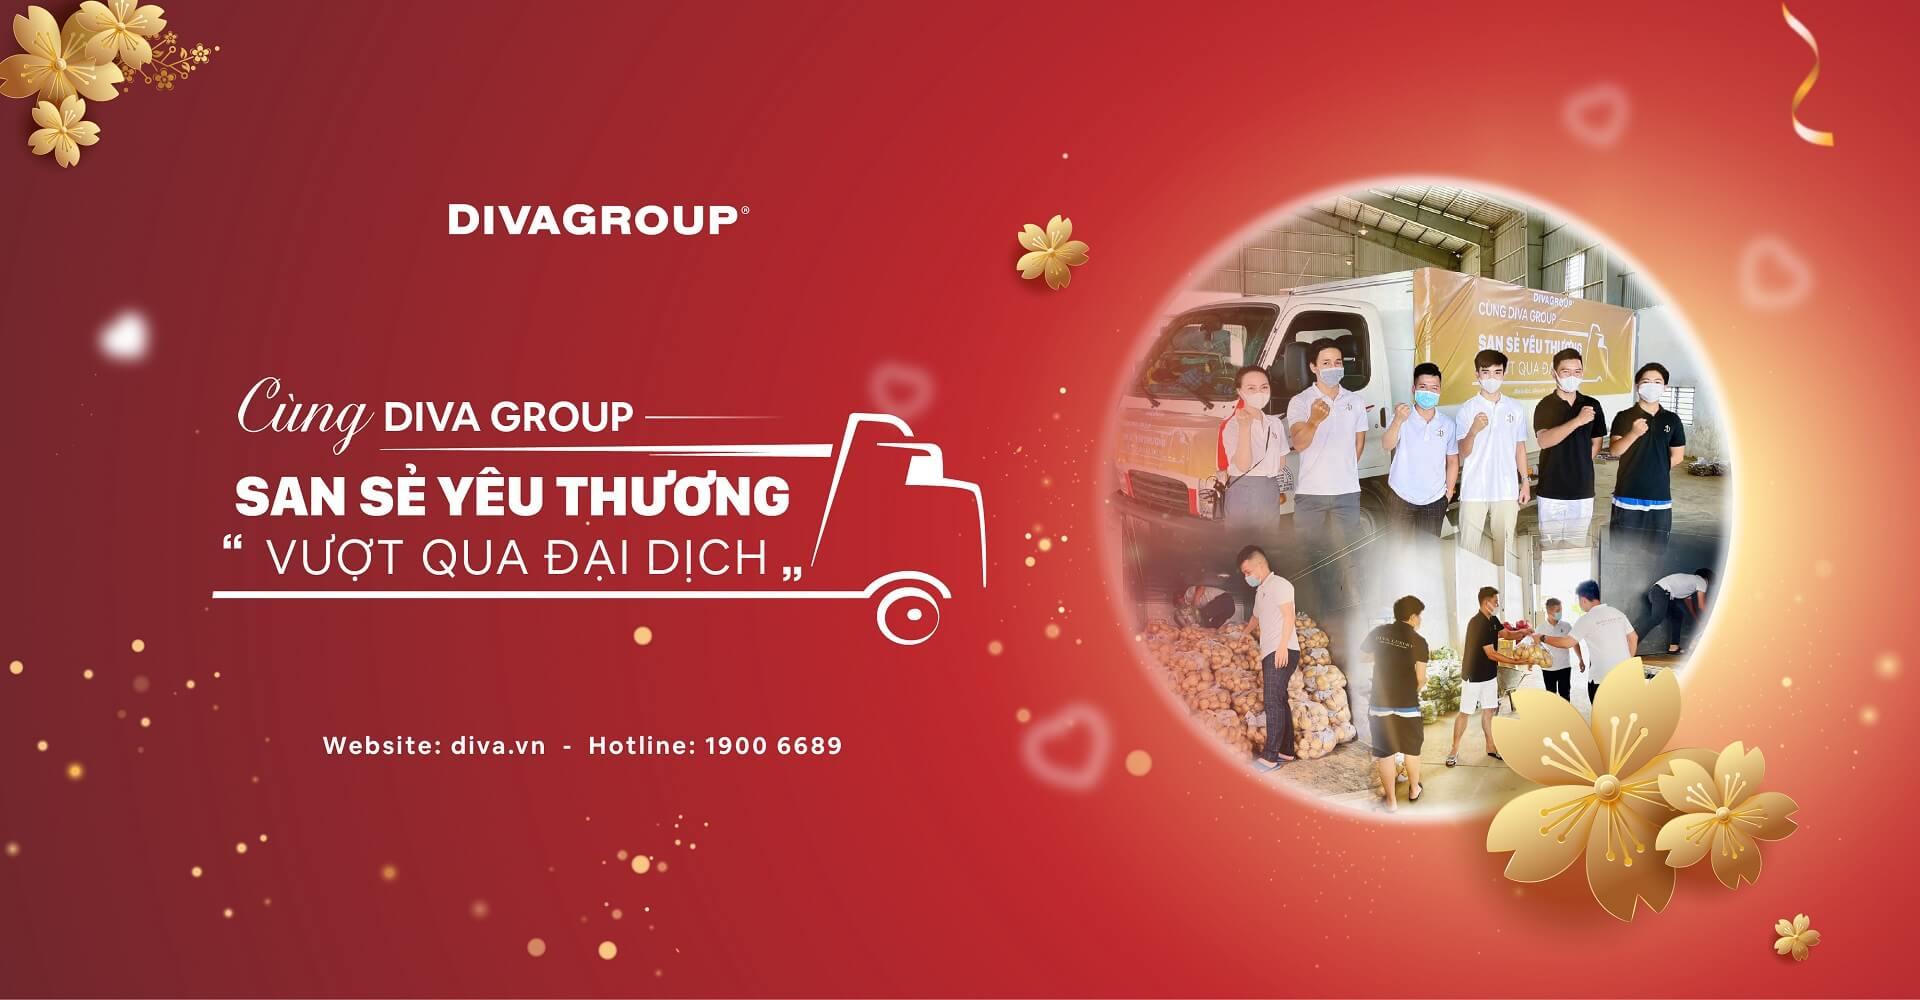 cung-diva-group-san-se-yeu-thuong-vuot-qua-dai-dich-PC-1